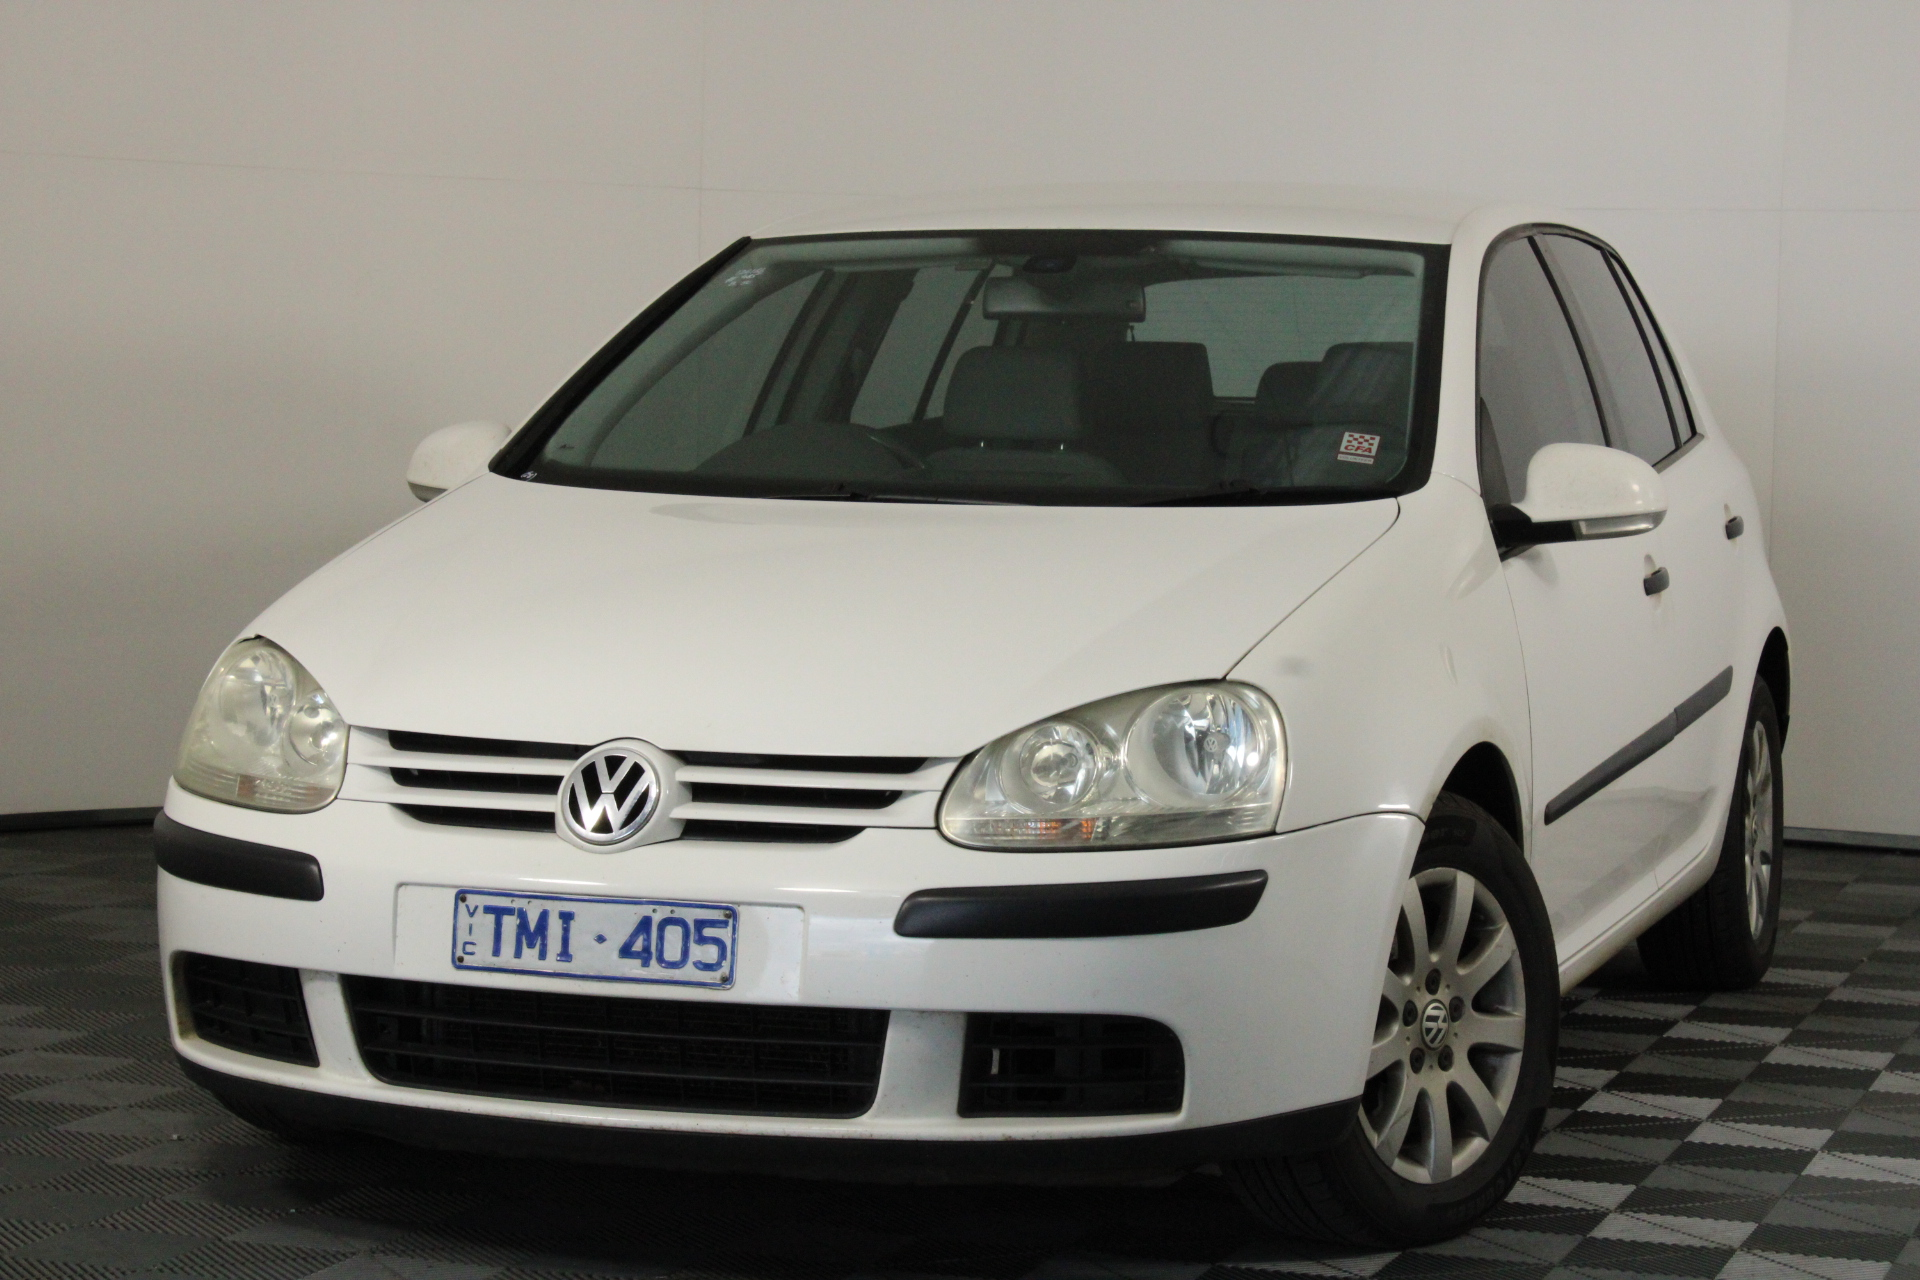 2005 Volkswagen Golf 2.0 TDI Comfortline 1k Turbo Diesel Auto Hatch